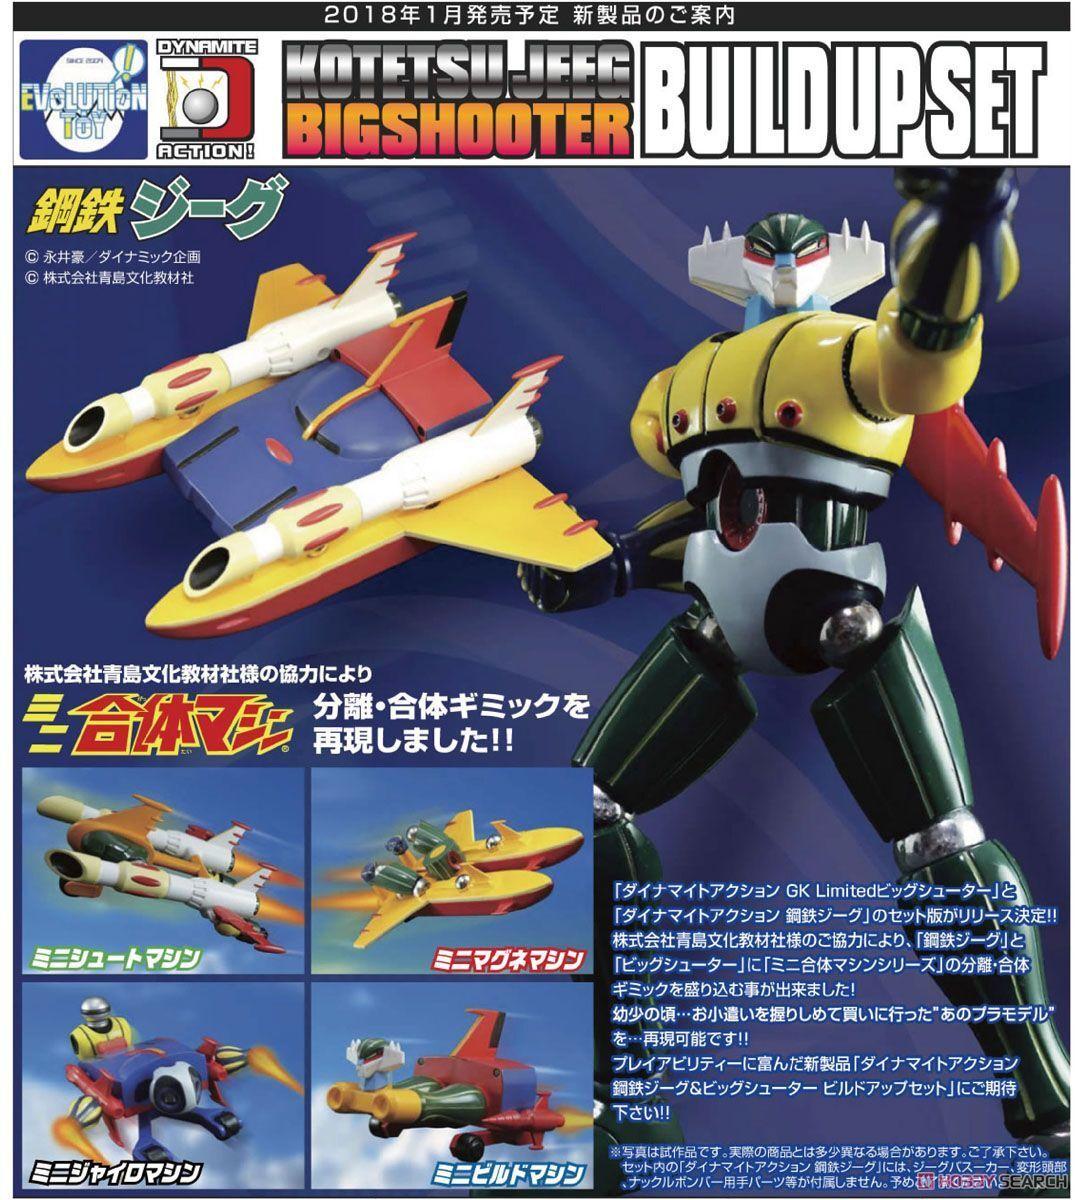 Steel Jeeg Robot D'steel & Bigshooter Build Up Dynamite Action Evolution Toy